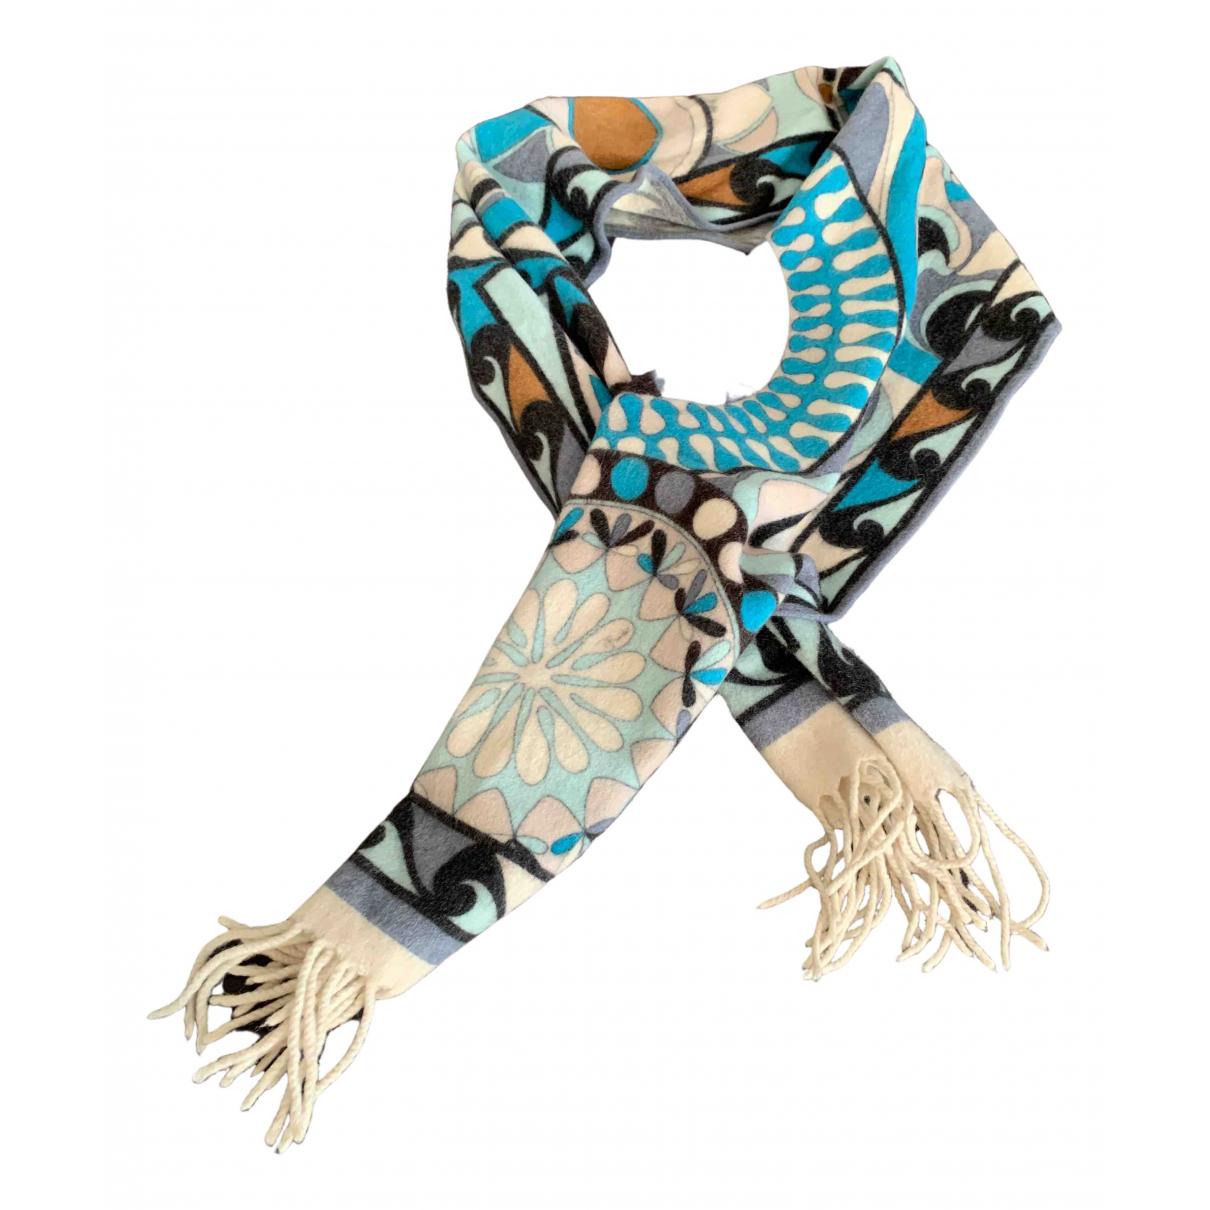 Emilio Pucci N Cashmere scarf for Women N